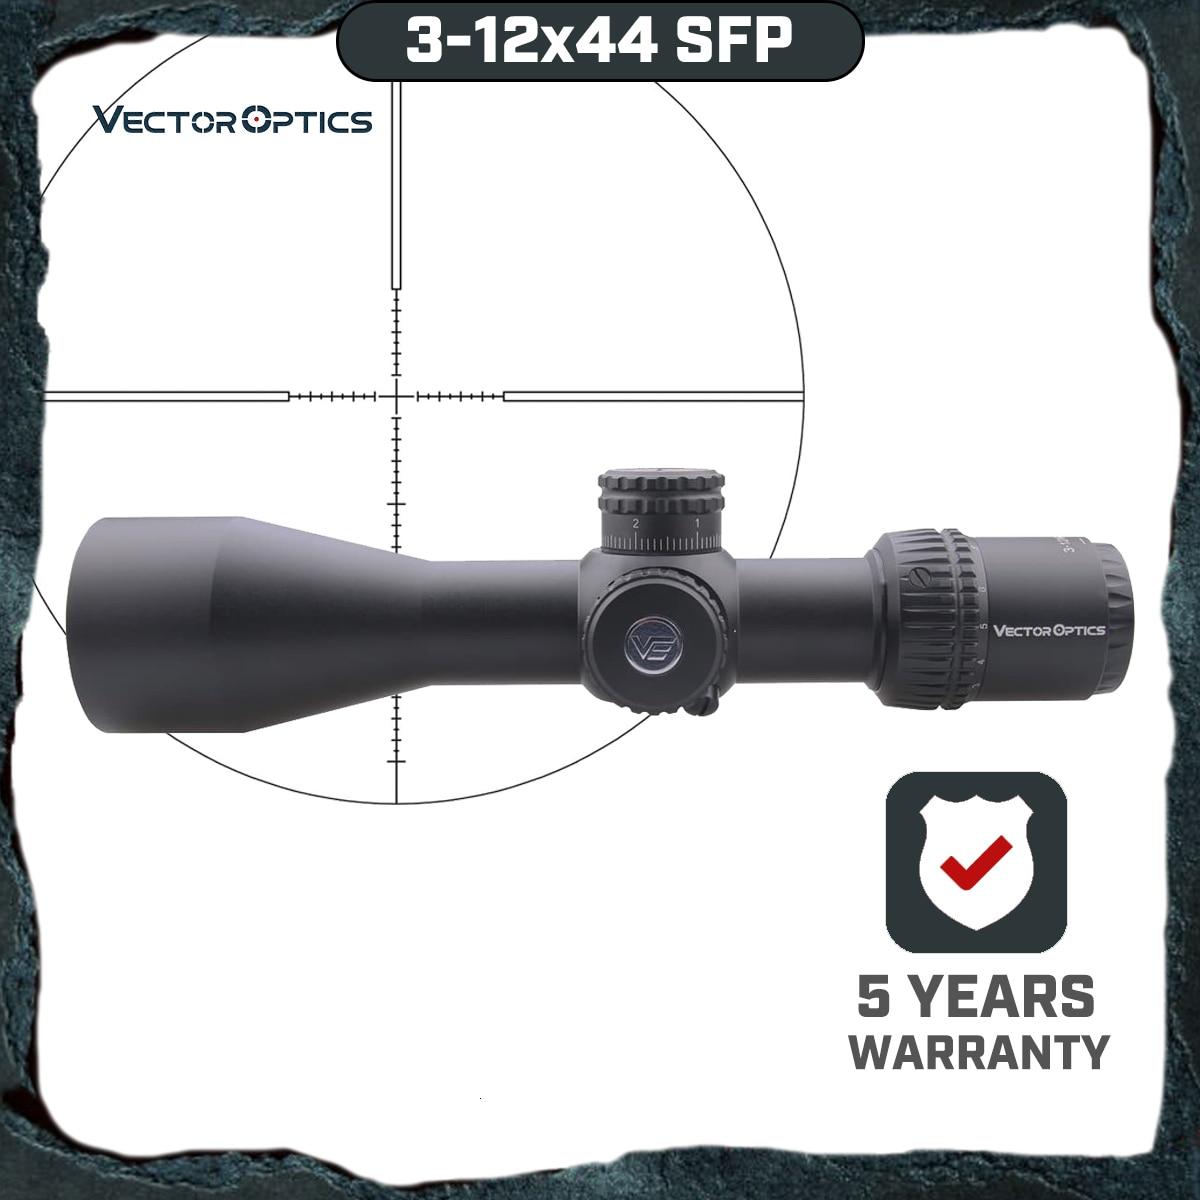 Vector Optics Veyron SFP 3-12x44 Riflescope Ultra Compact Air Rifle Scope Second Focal Plane Air Gun 1/10 MIL AR15 .223 7.62